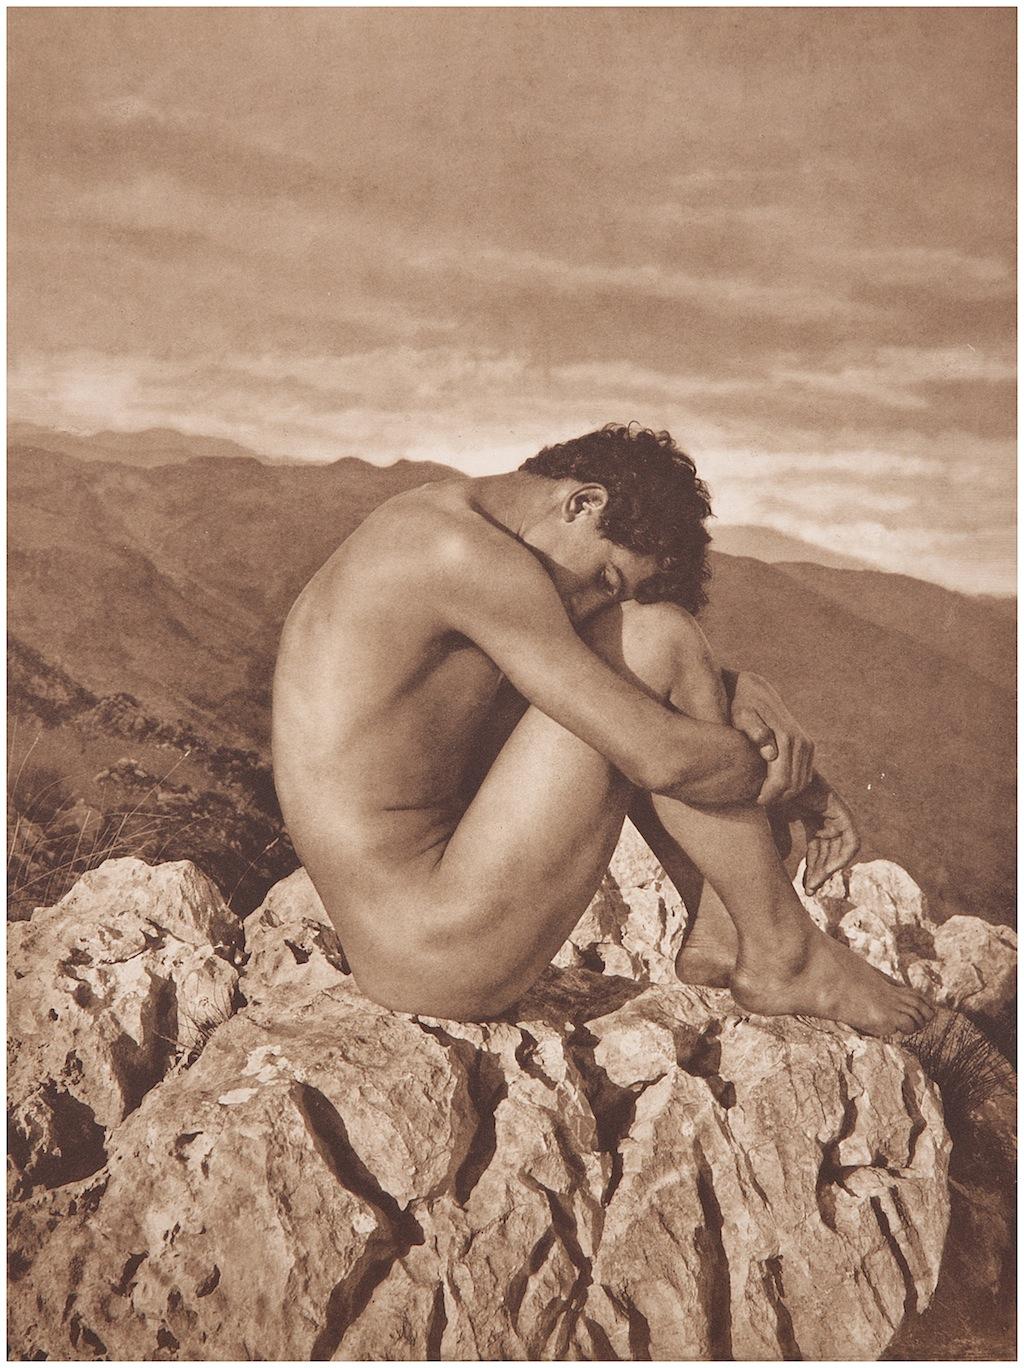 Photo de corps masculin